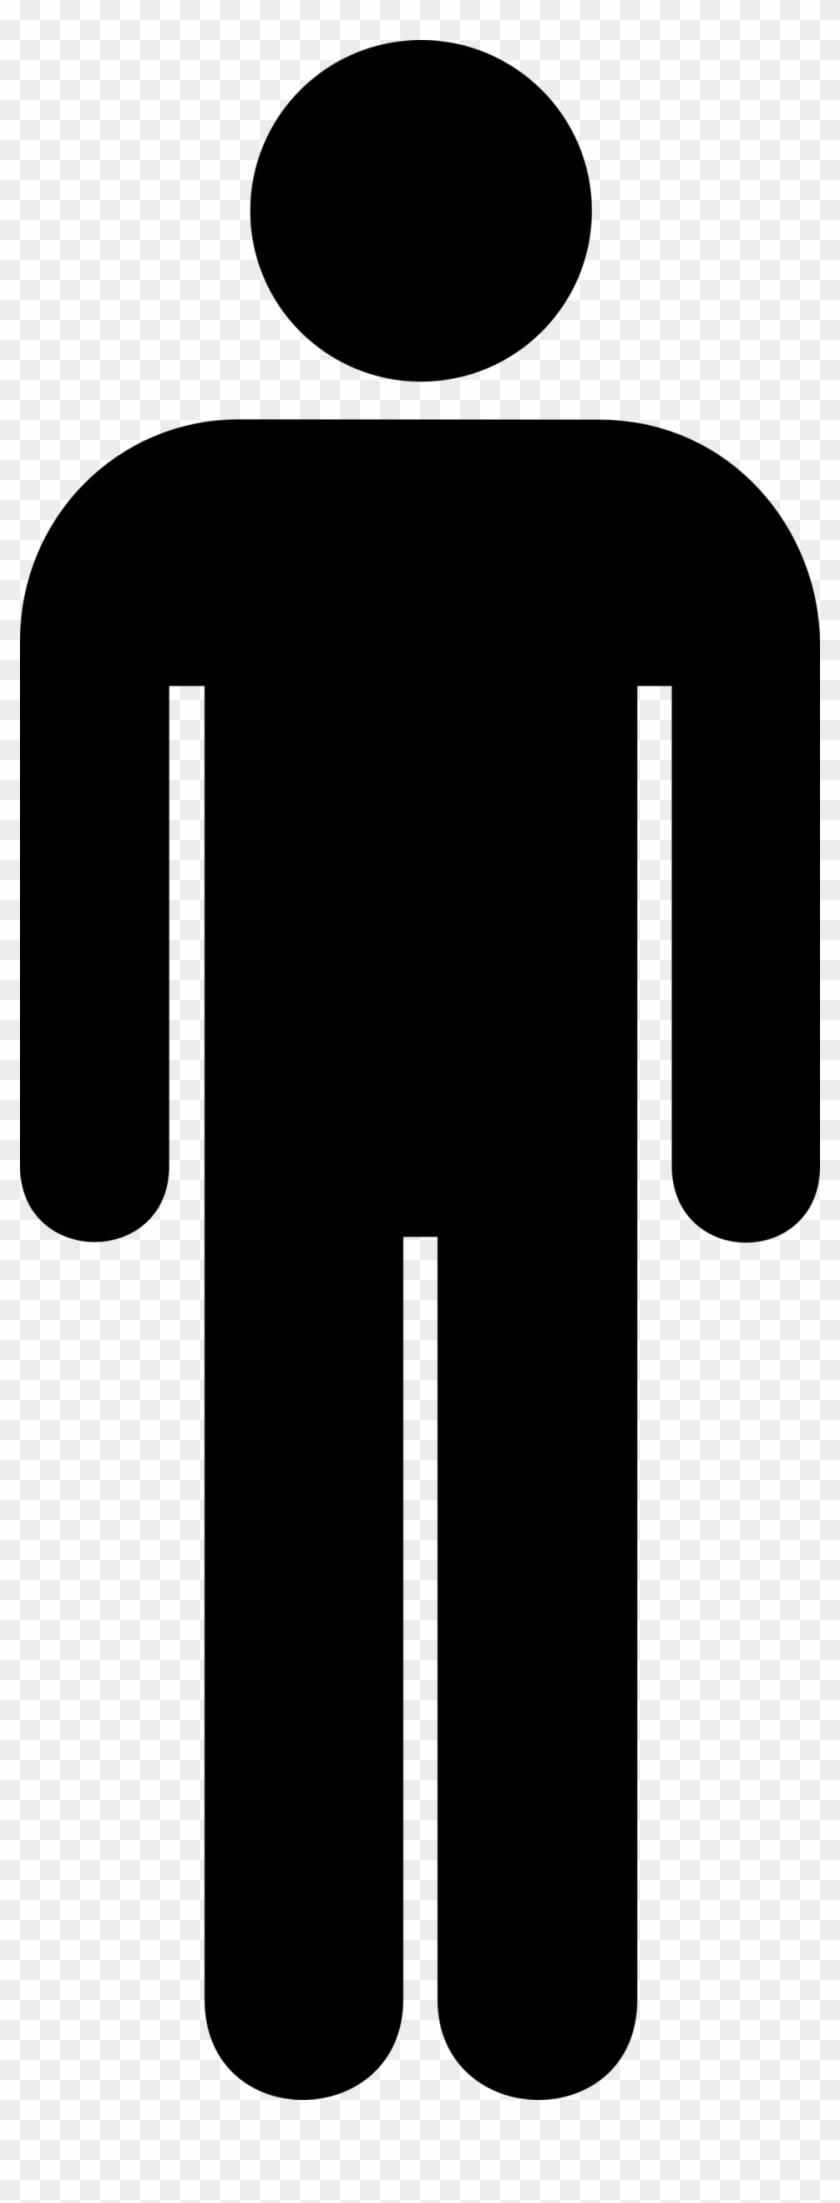 Ladies Bathroom Sign - Person Clipart Transparent Background #25528